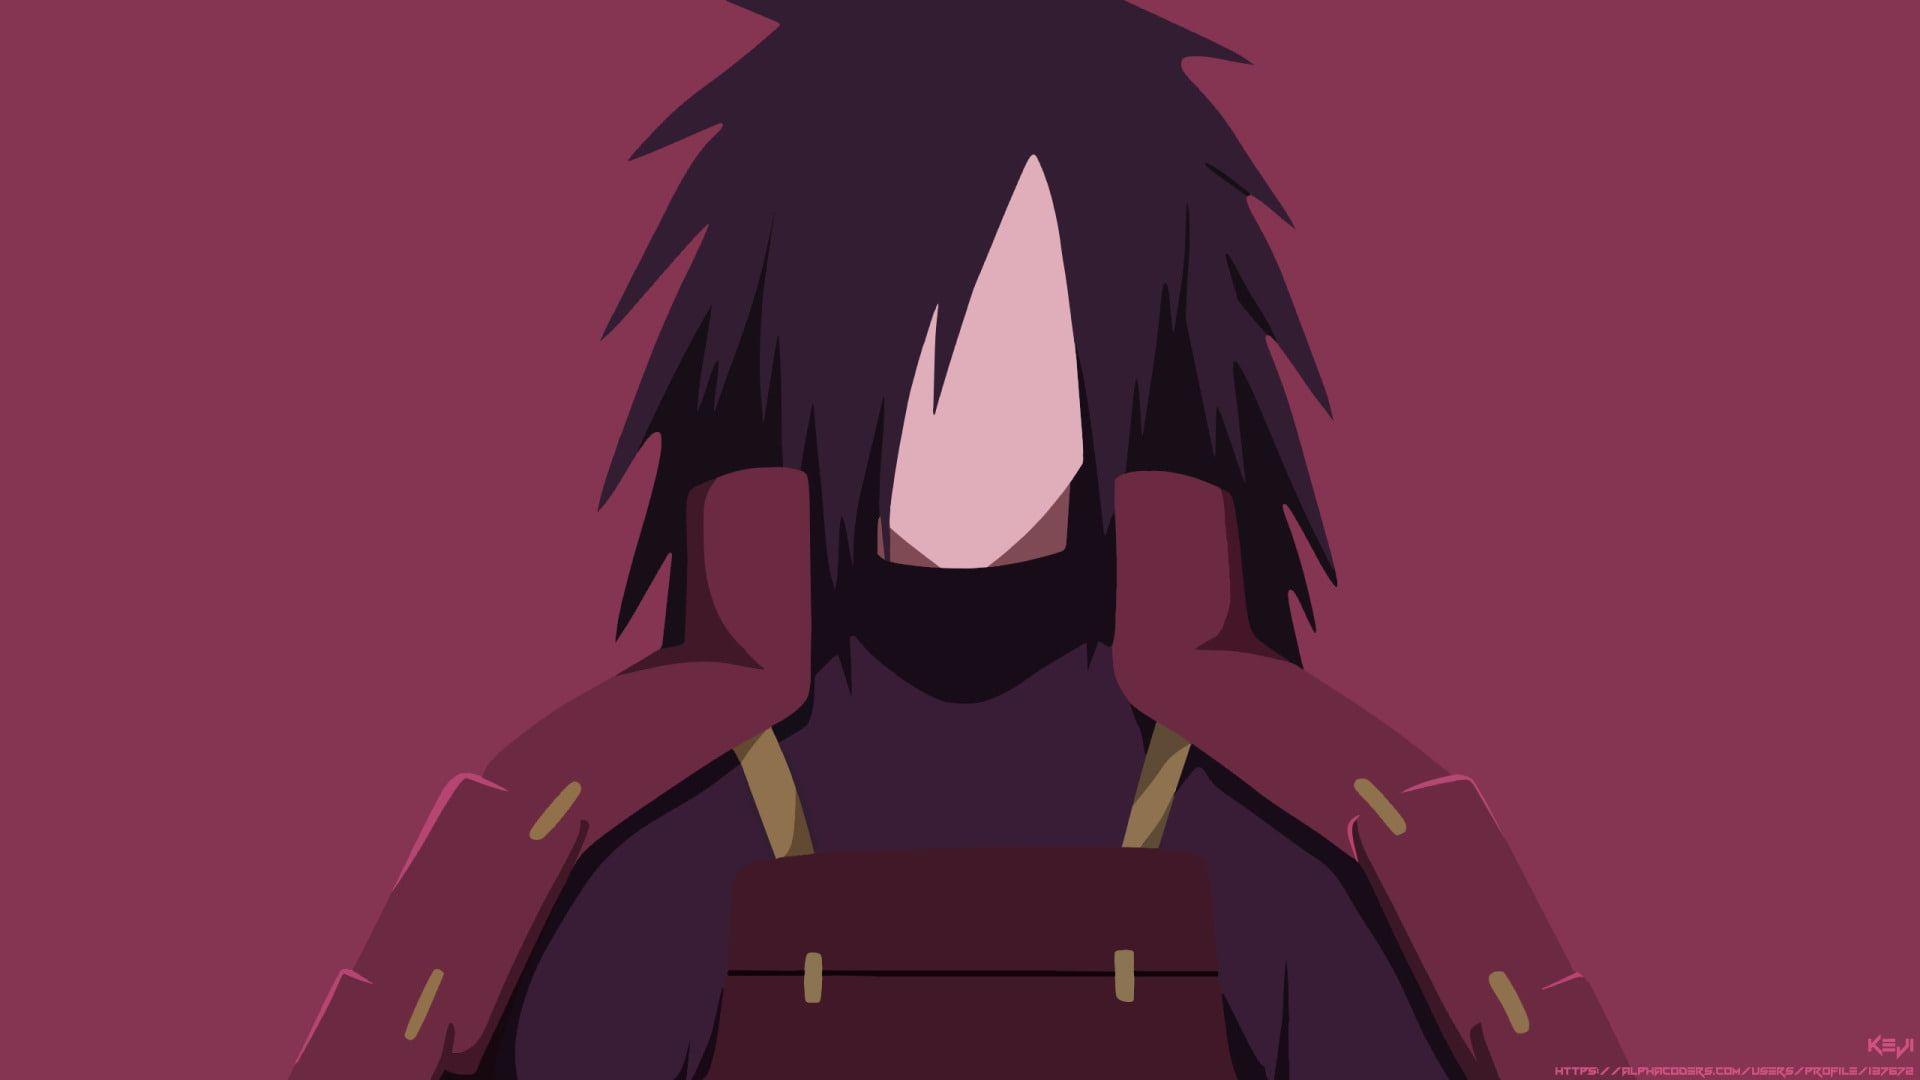 Anime Naruto Black Hair Boy Madara Uchiha Minimalist Uchiha Clan 1080p Wallpaper Hdwallpap Hd Anime Wallpapers Profile Wallpaper Naruto Wallpaper Iphone